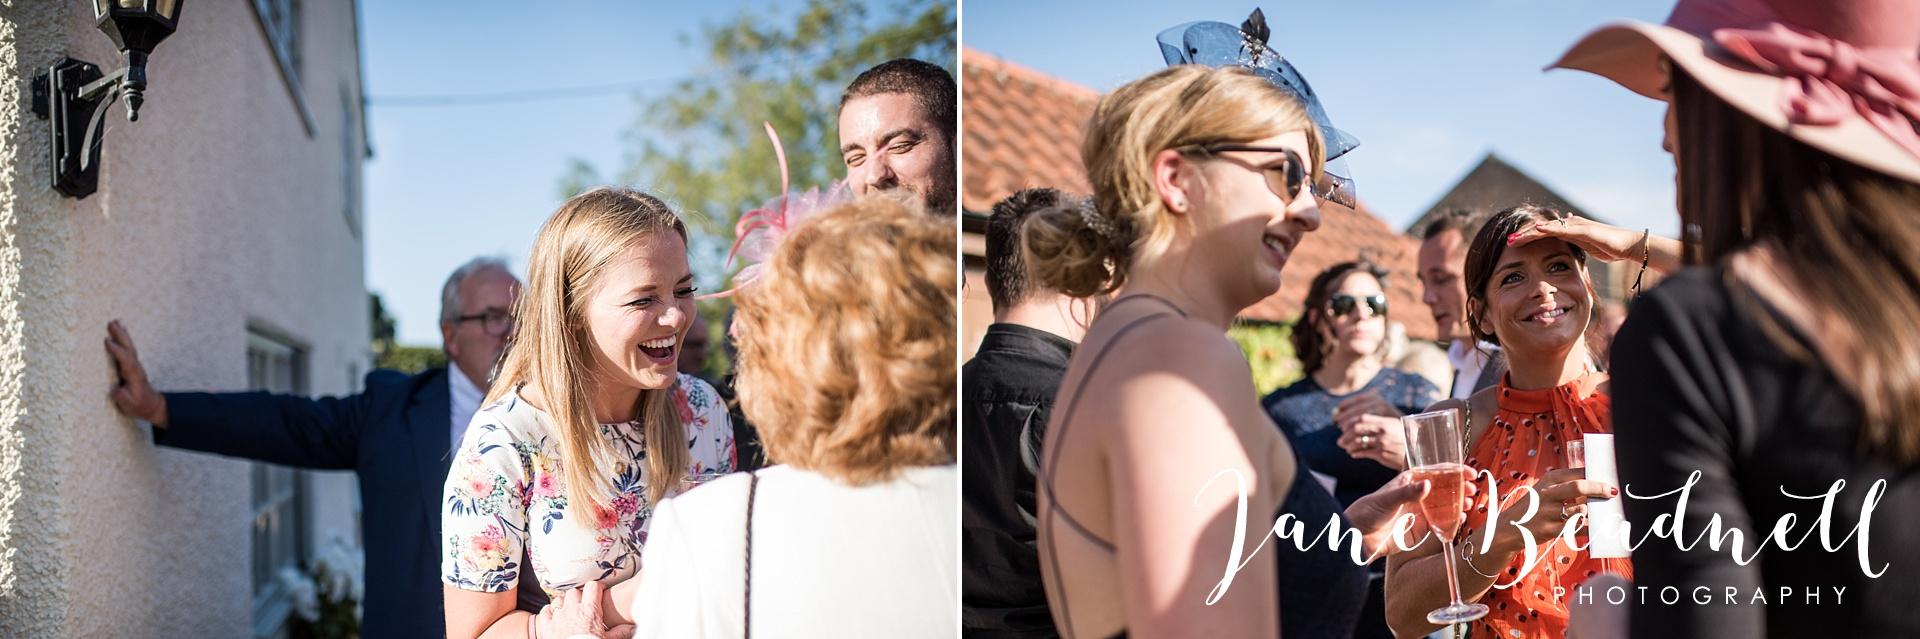 fine-art-wedding-photographer-jane-beadnell-yorkshire-wedding-photographer-garden-wedding_0083